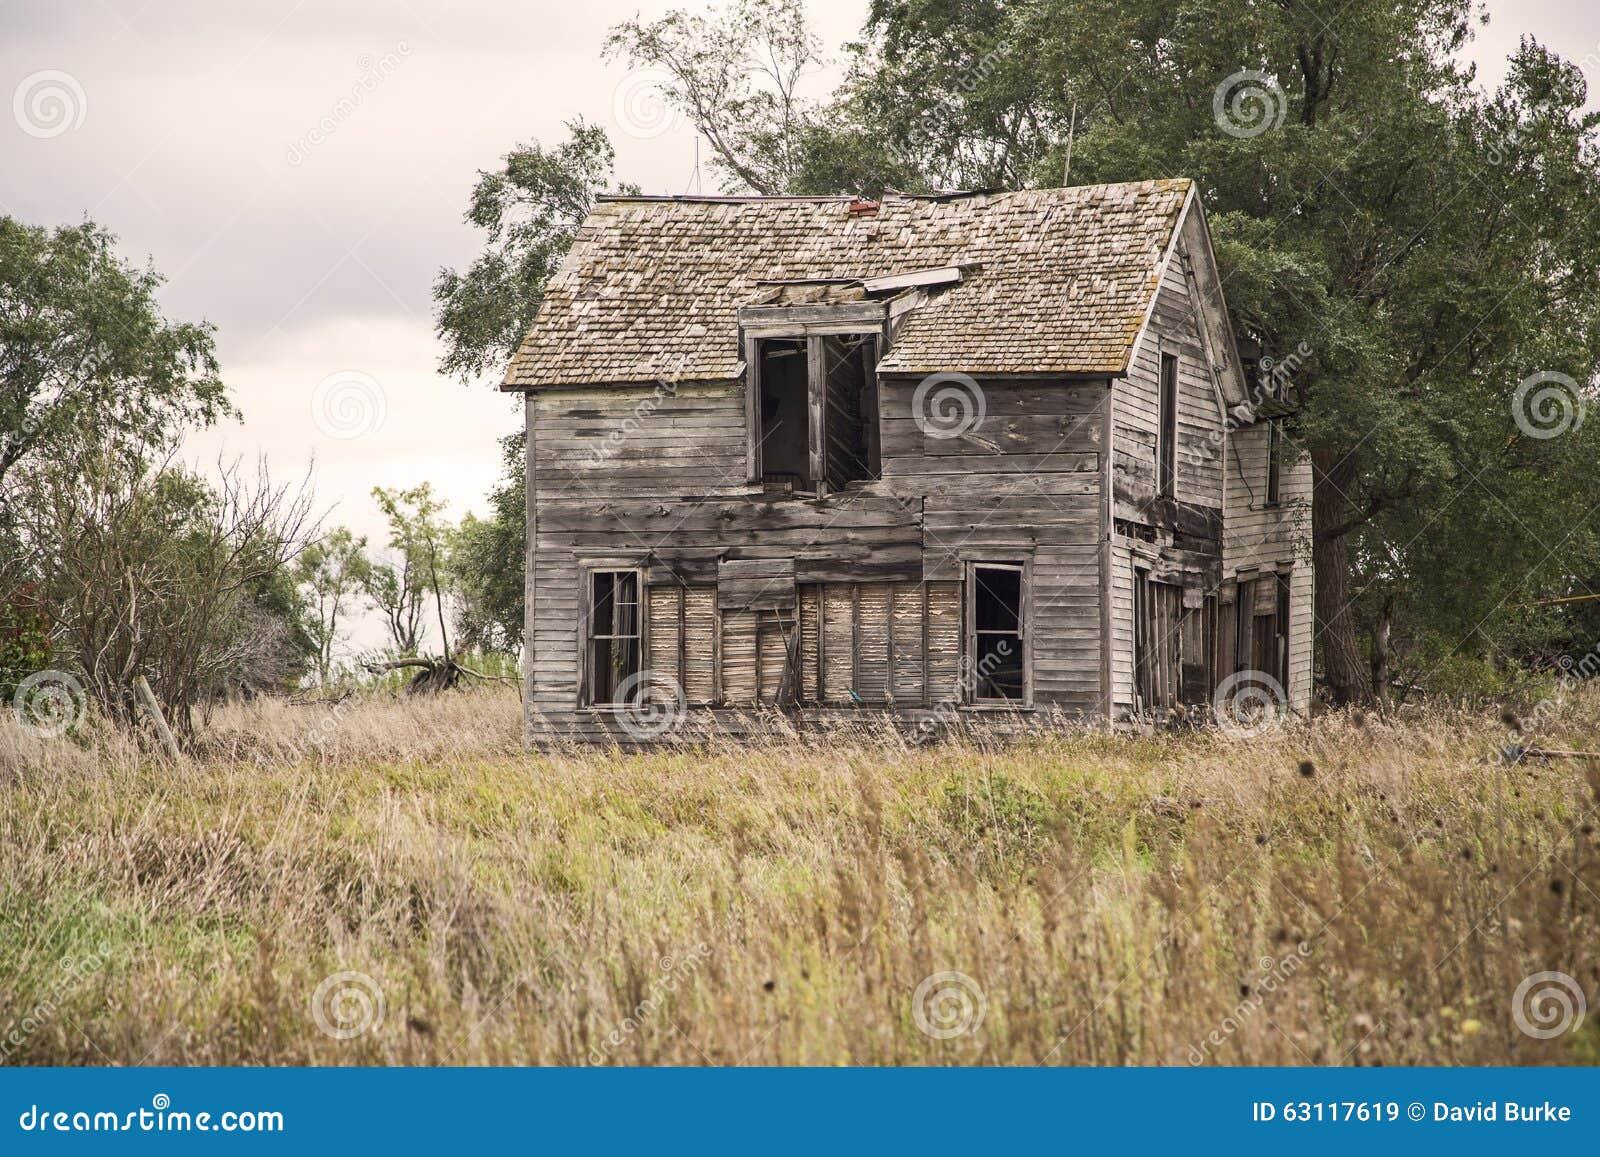 Antique Wooden Rural Farm House Stock Photo Image 63117619